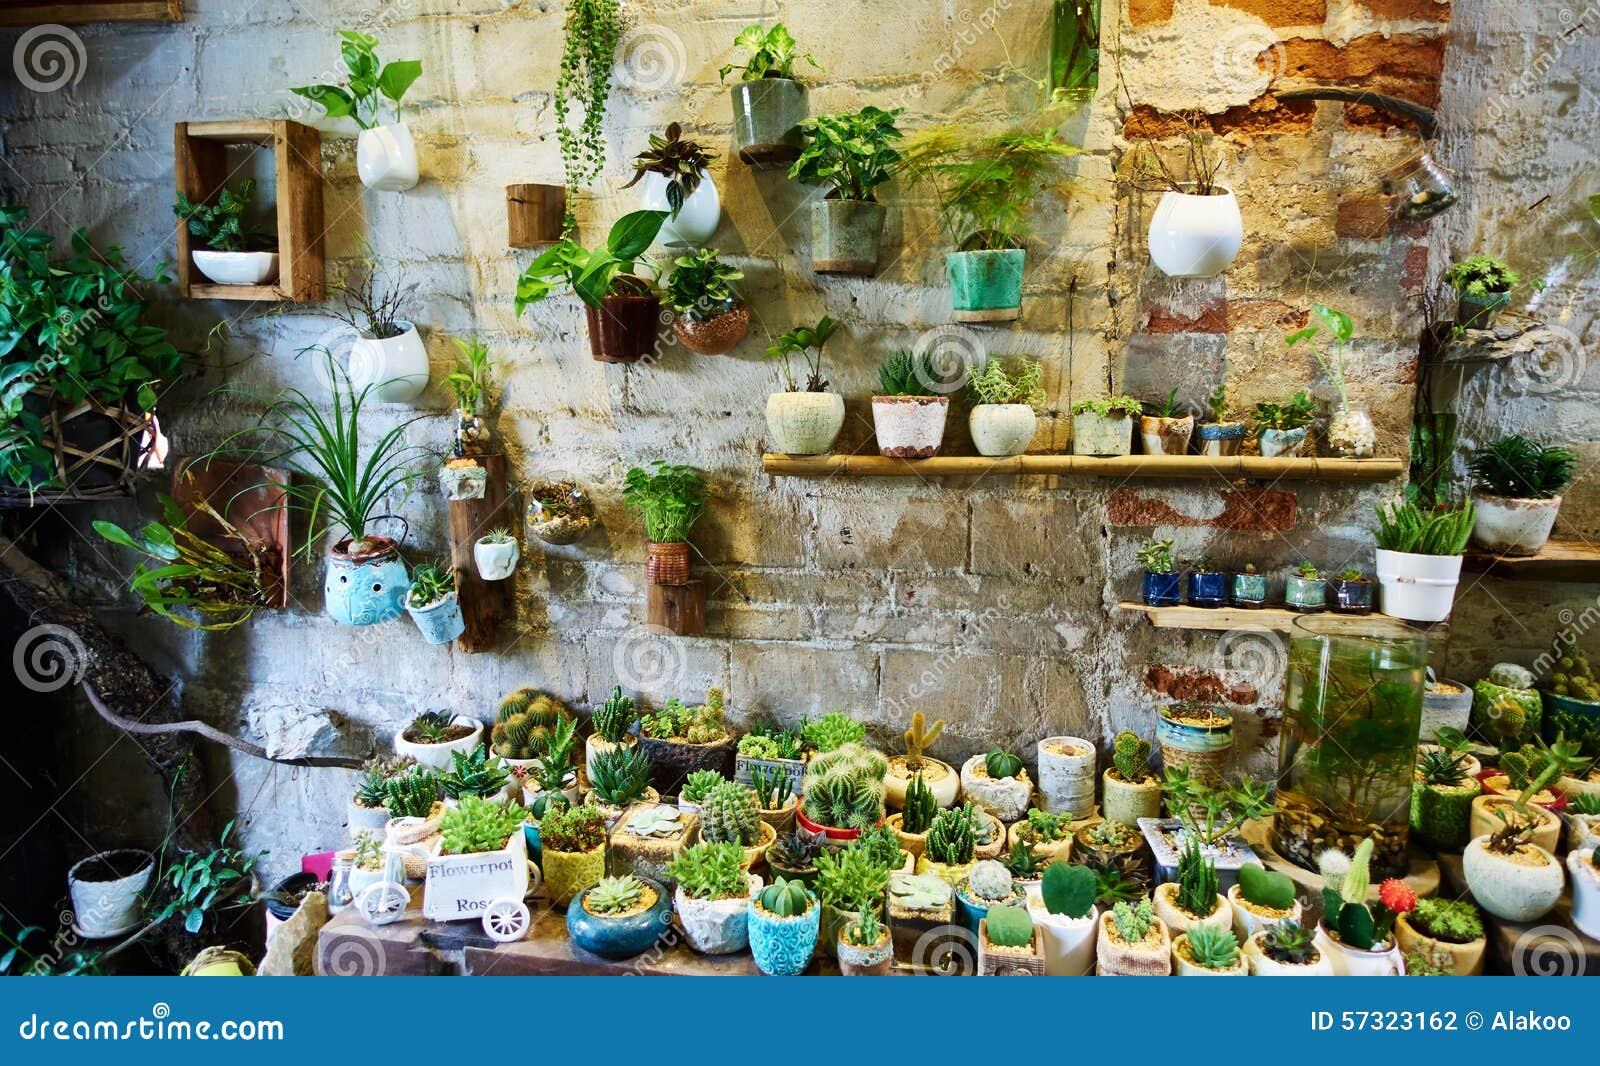 Flower shop stock photo. Image of sale, plants, interior - 57323162